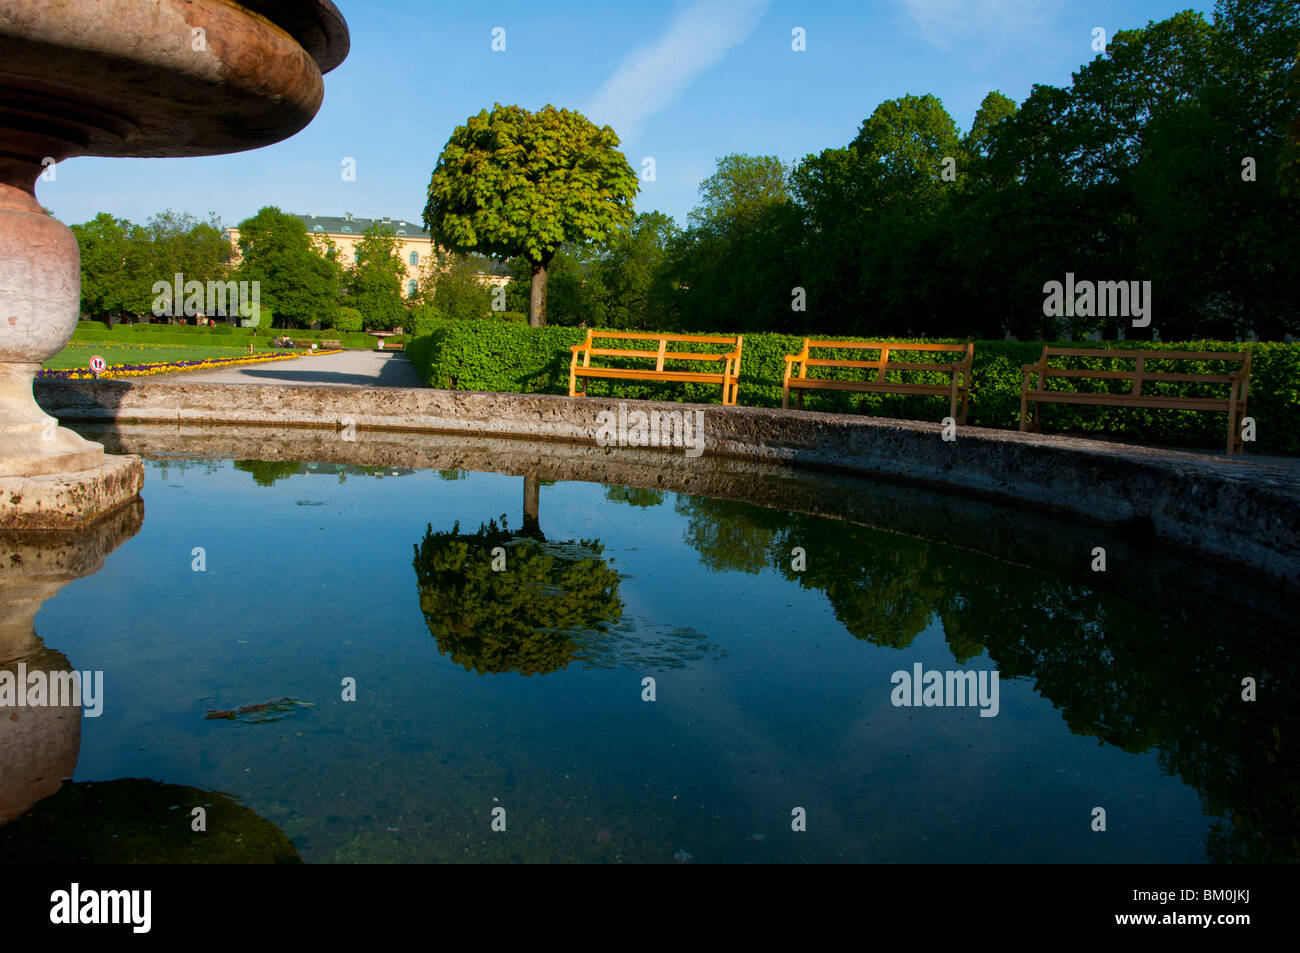 Hofgarten fountain water reflections. Munich, Germany. - Stock Image